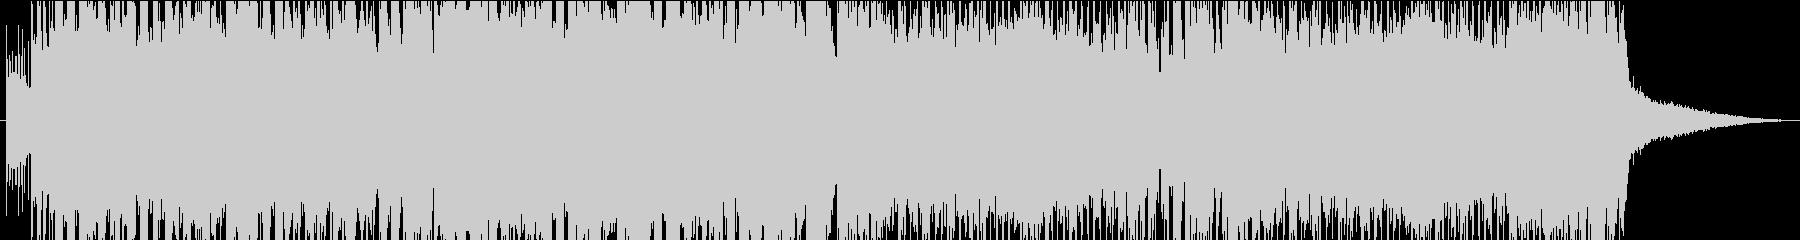 Music Game HARDCORE !!'s unreproduced waveform